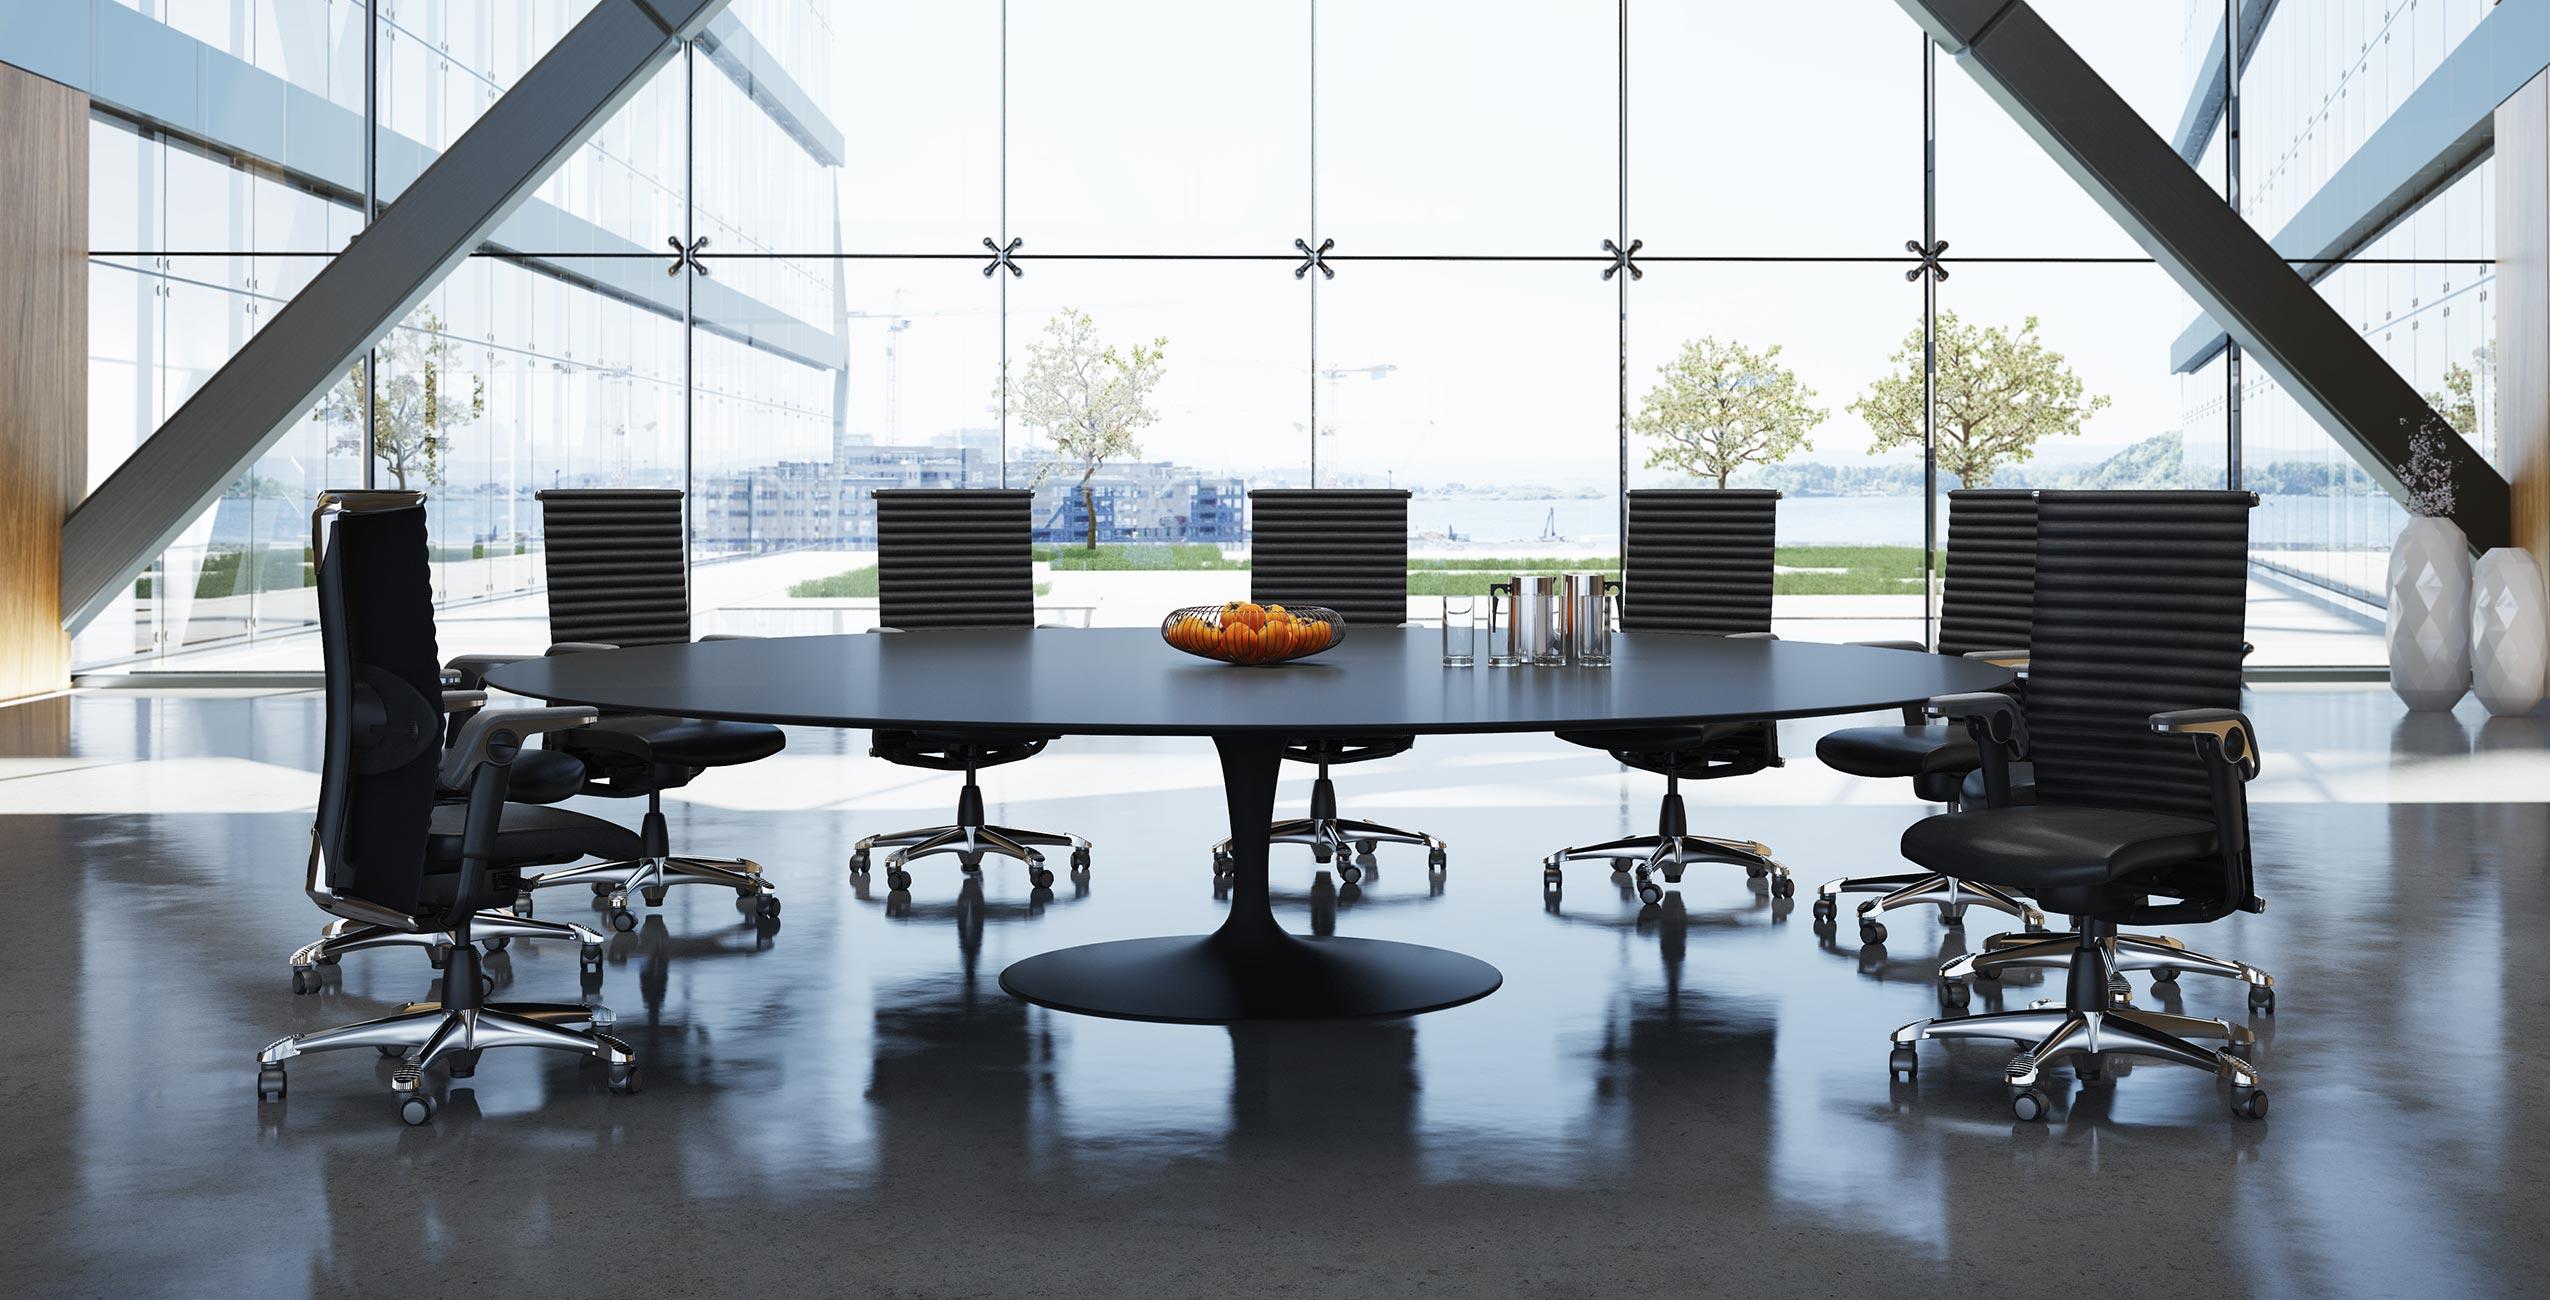 https://cdn2.hubspot.net/hubfs/2778069/Designers/Svein%20Asbj%C3%B8rnsen/Boardroom-H%C3%85G-Excellence.jpg